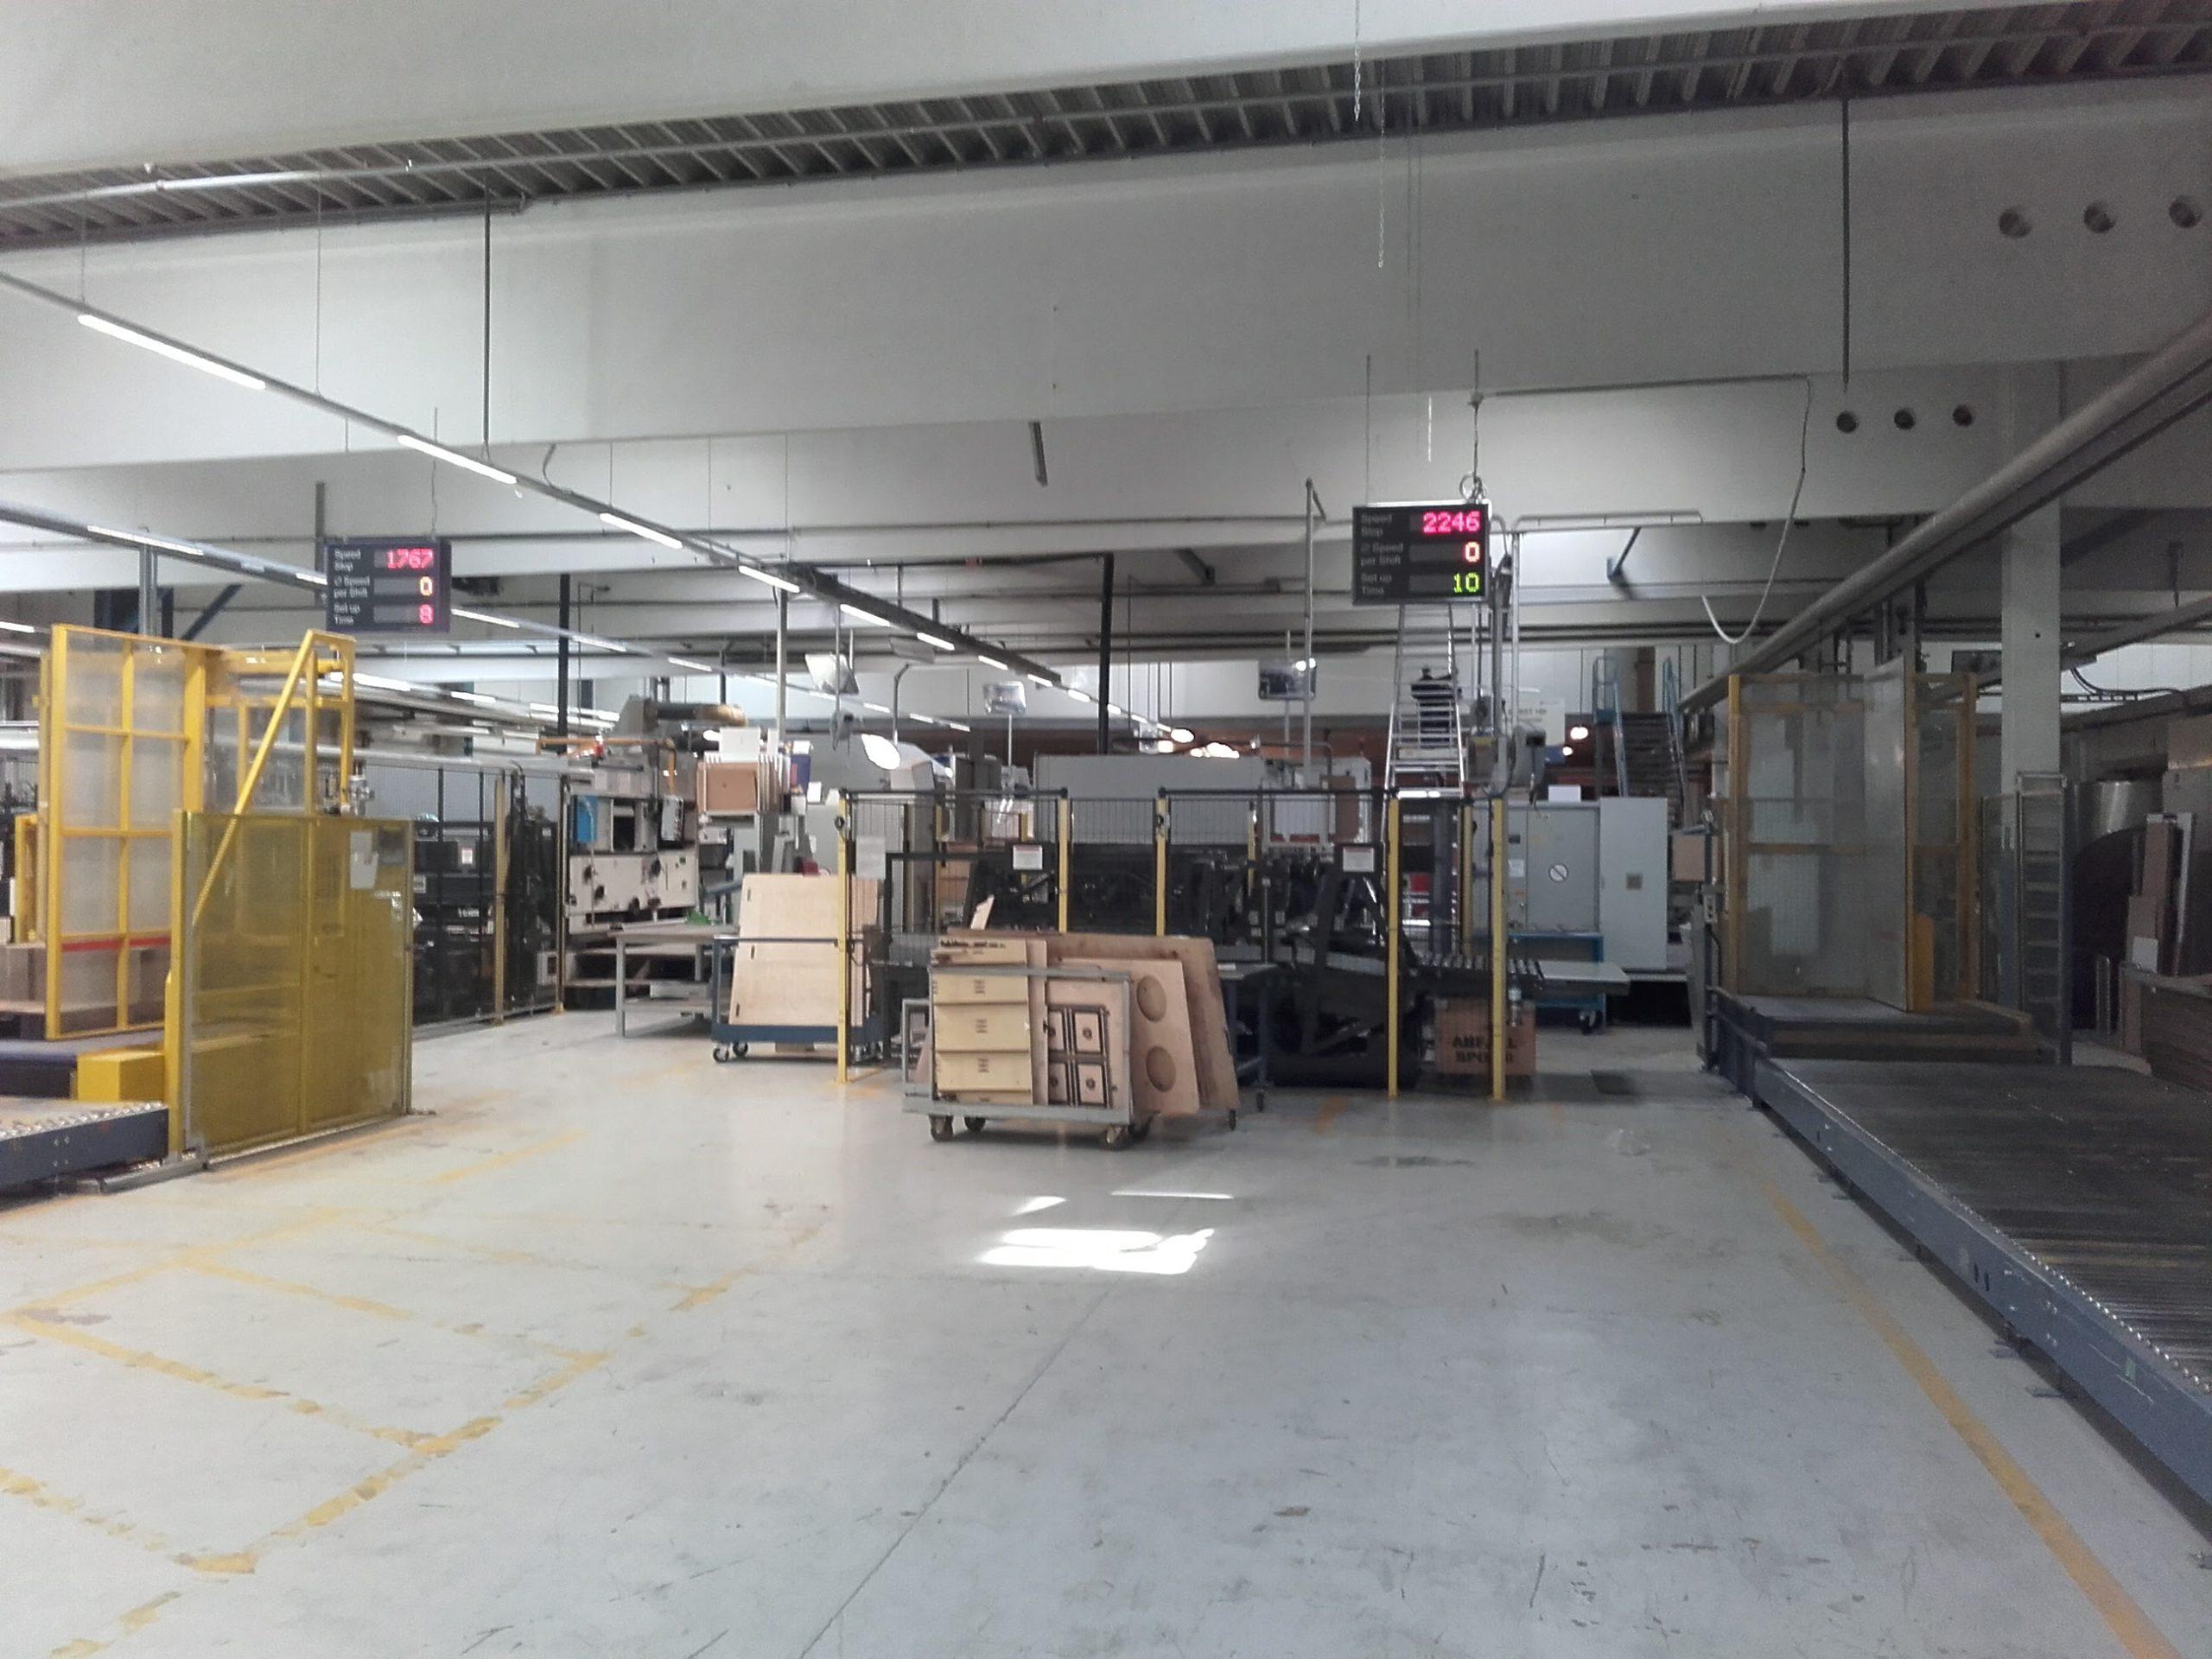 LED Beleuchtung Referenzprojekt Industrie Hallenbeleuchtung